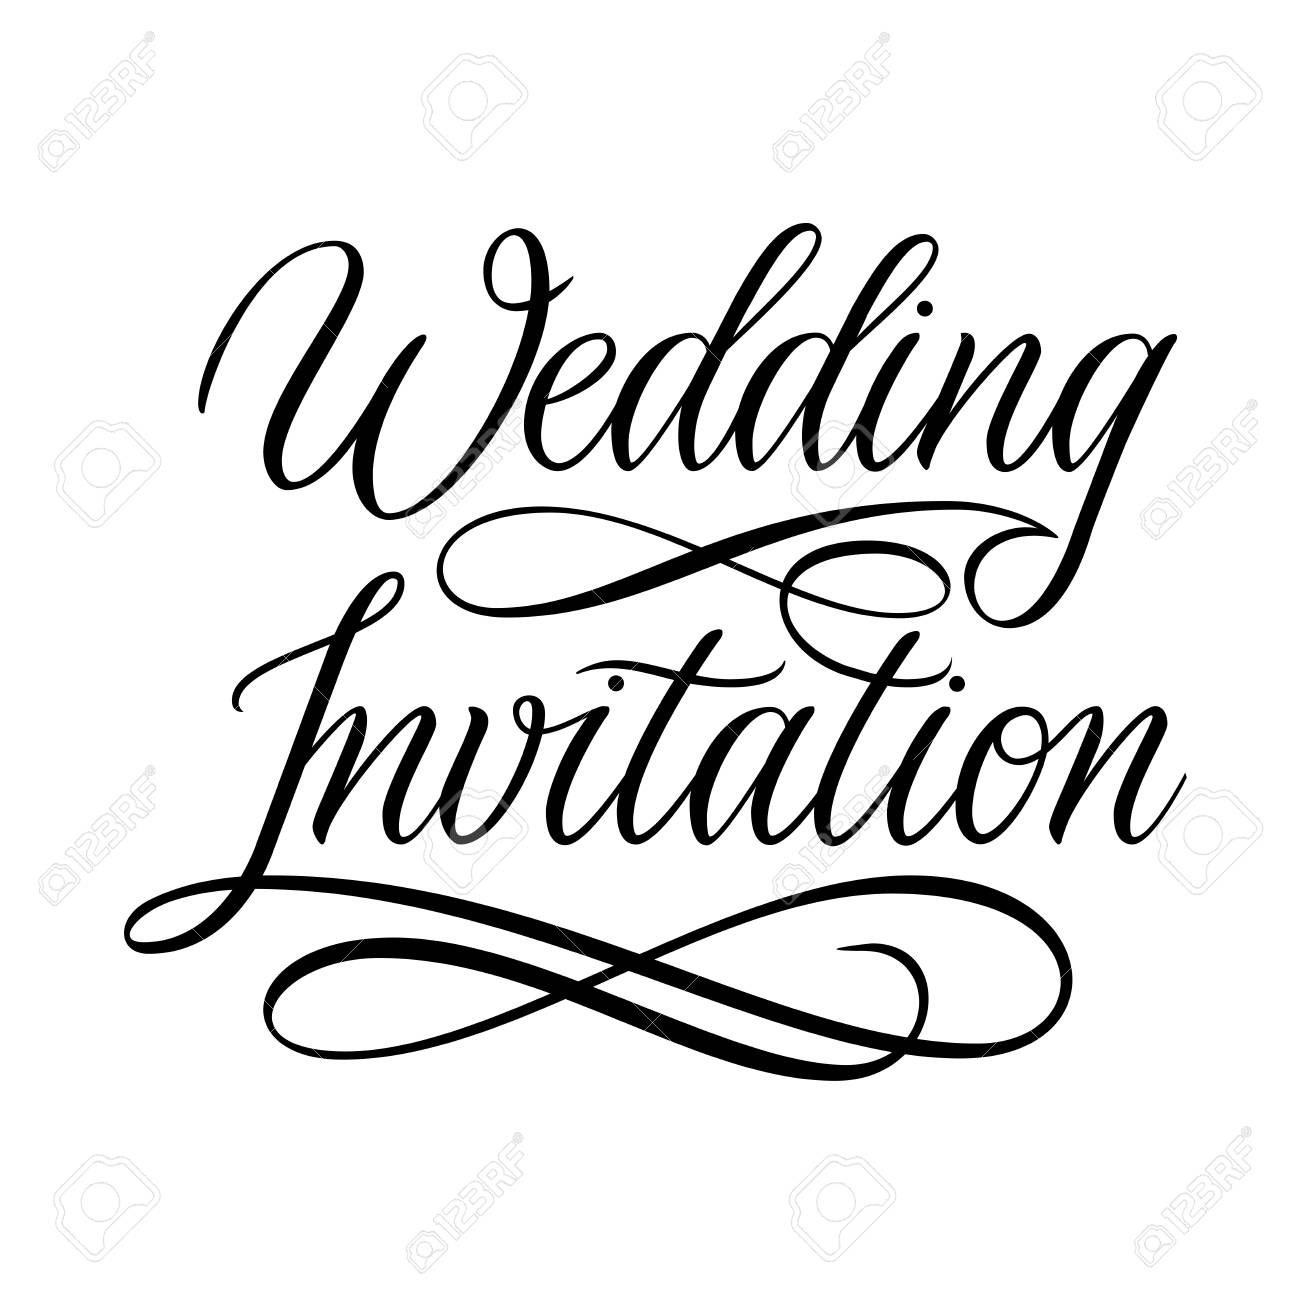 wedding invitation card design hand written calligraphy flourish